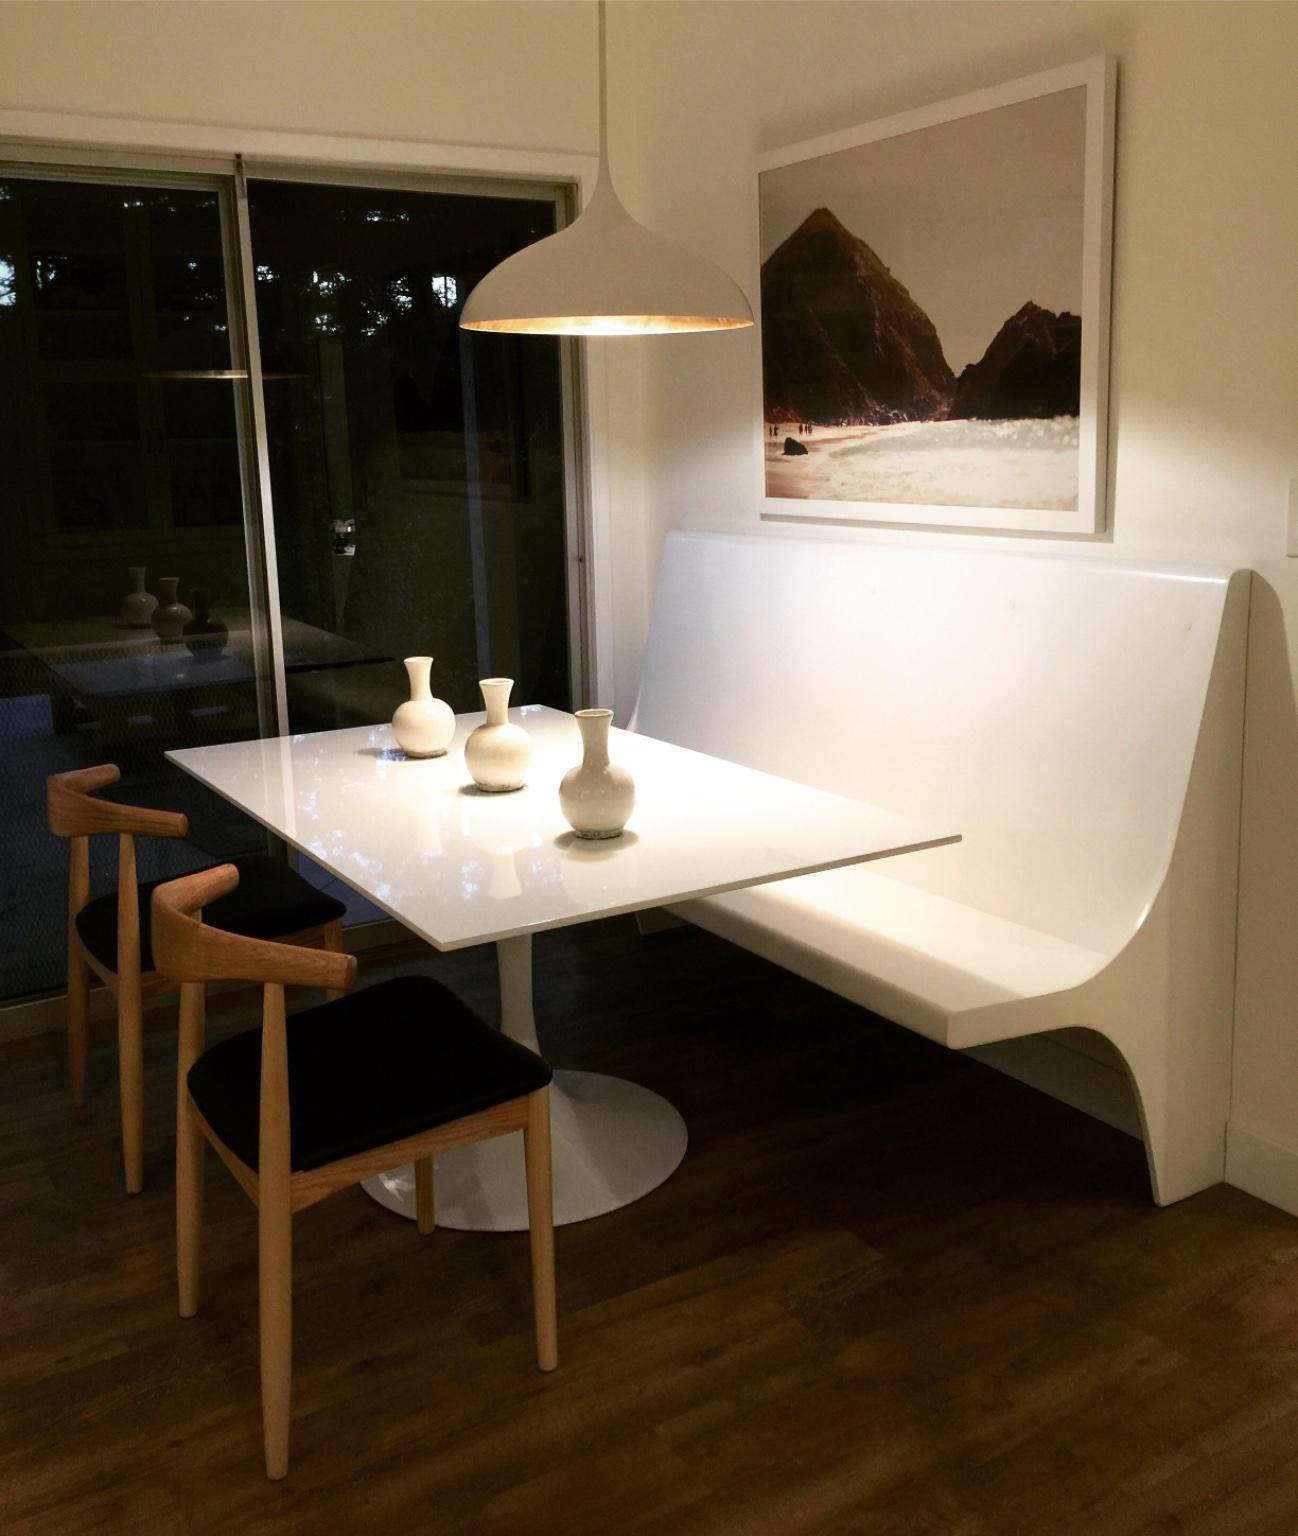 san diego furniture repair gressitt woodworking studio